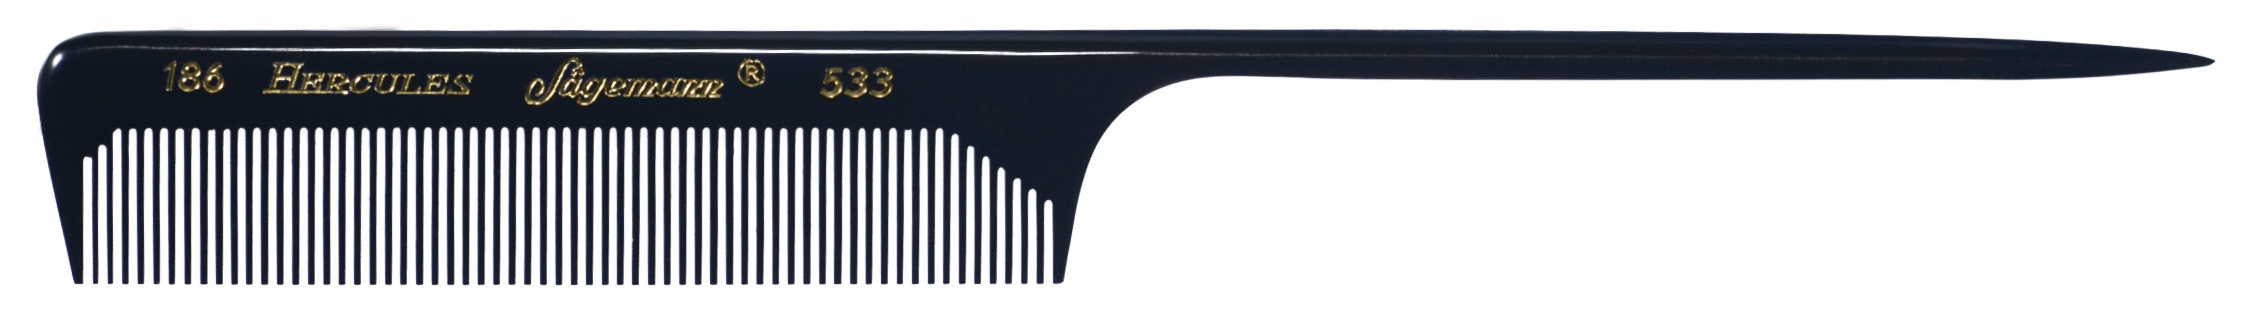 peigne queue mod le 186 533 hercules 7 39 3 4. Black Bedroom Furniture Sets. Home Design Ideas